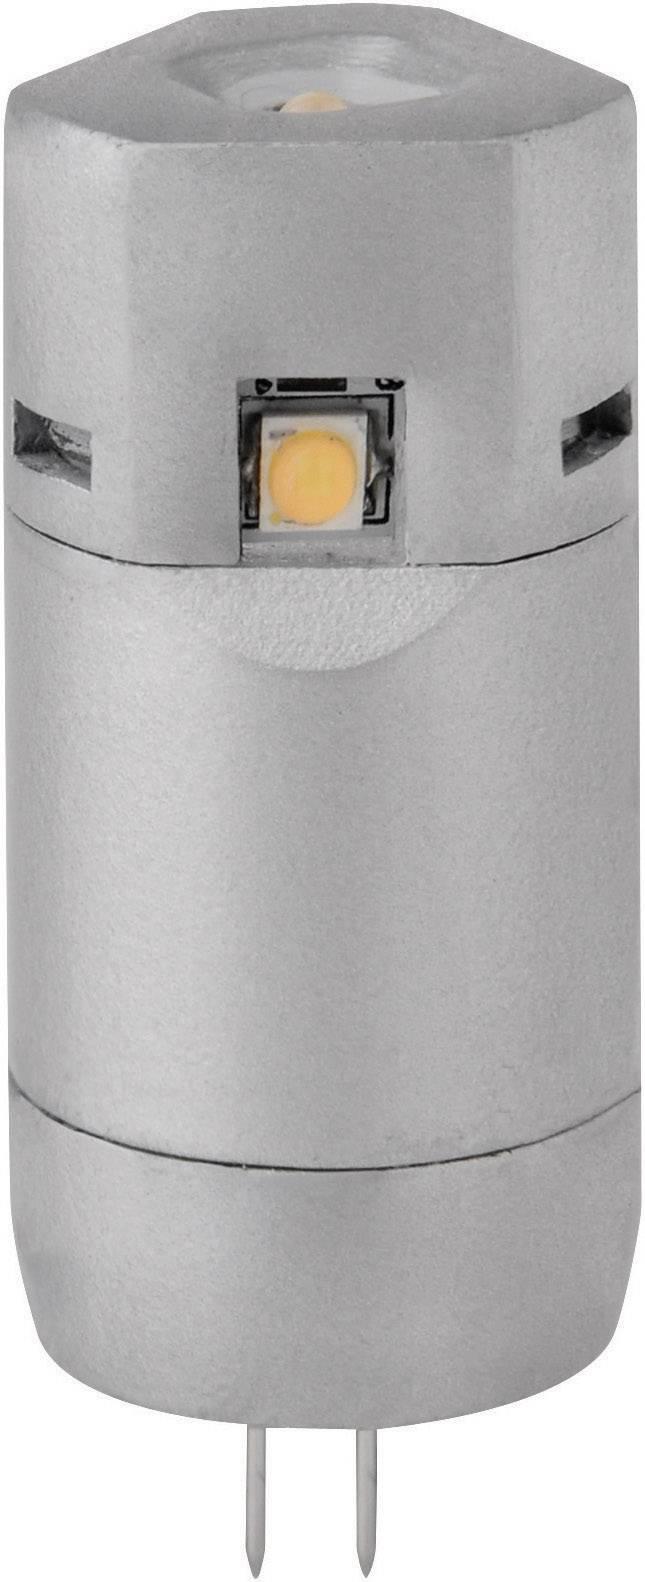 LED žárovka Megaman, MM49102, G4, 2 W, 12 V, teplá bílá